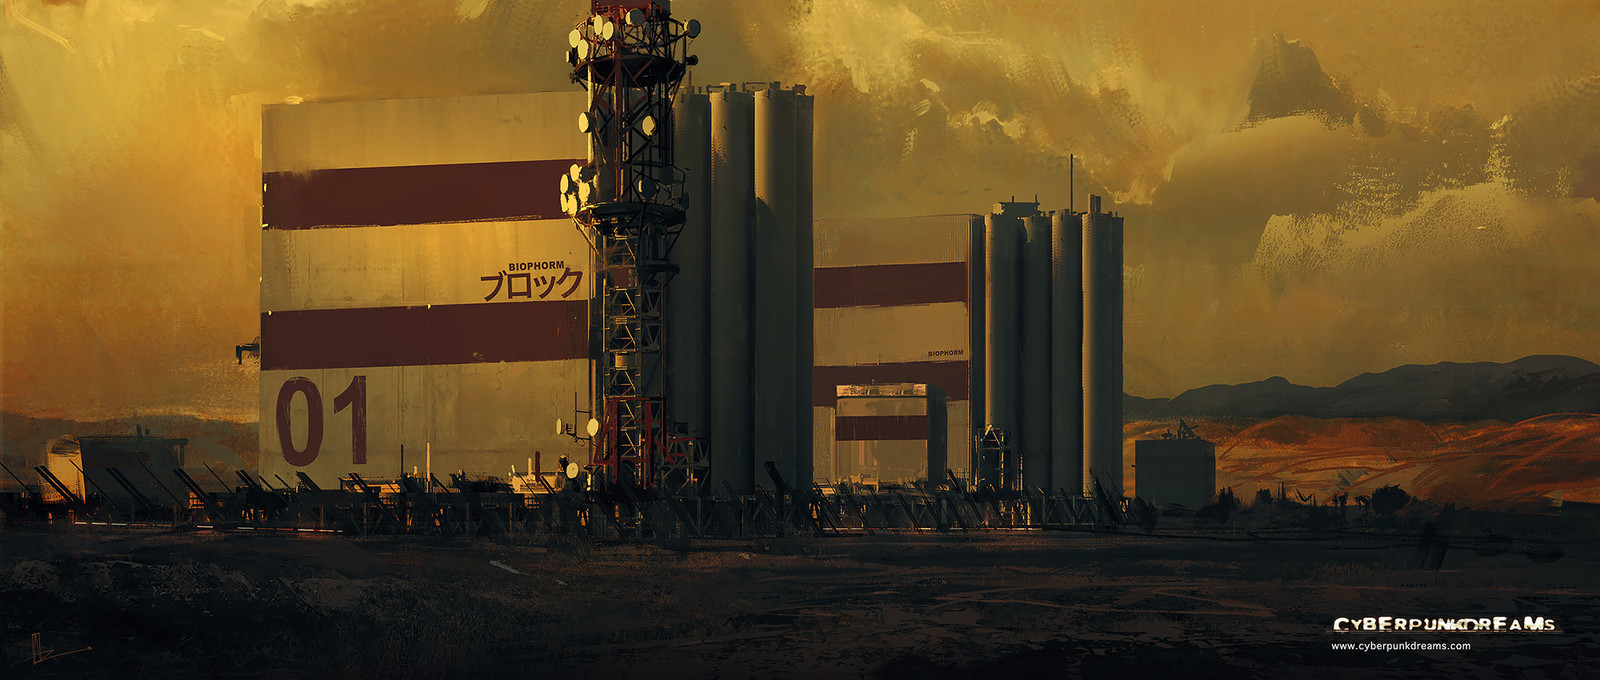 CYBERPUNKDREAMS Project/ Factory site